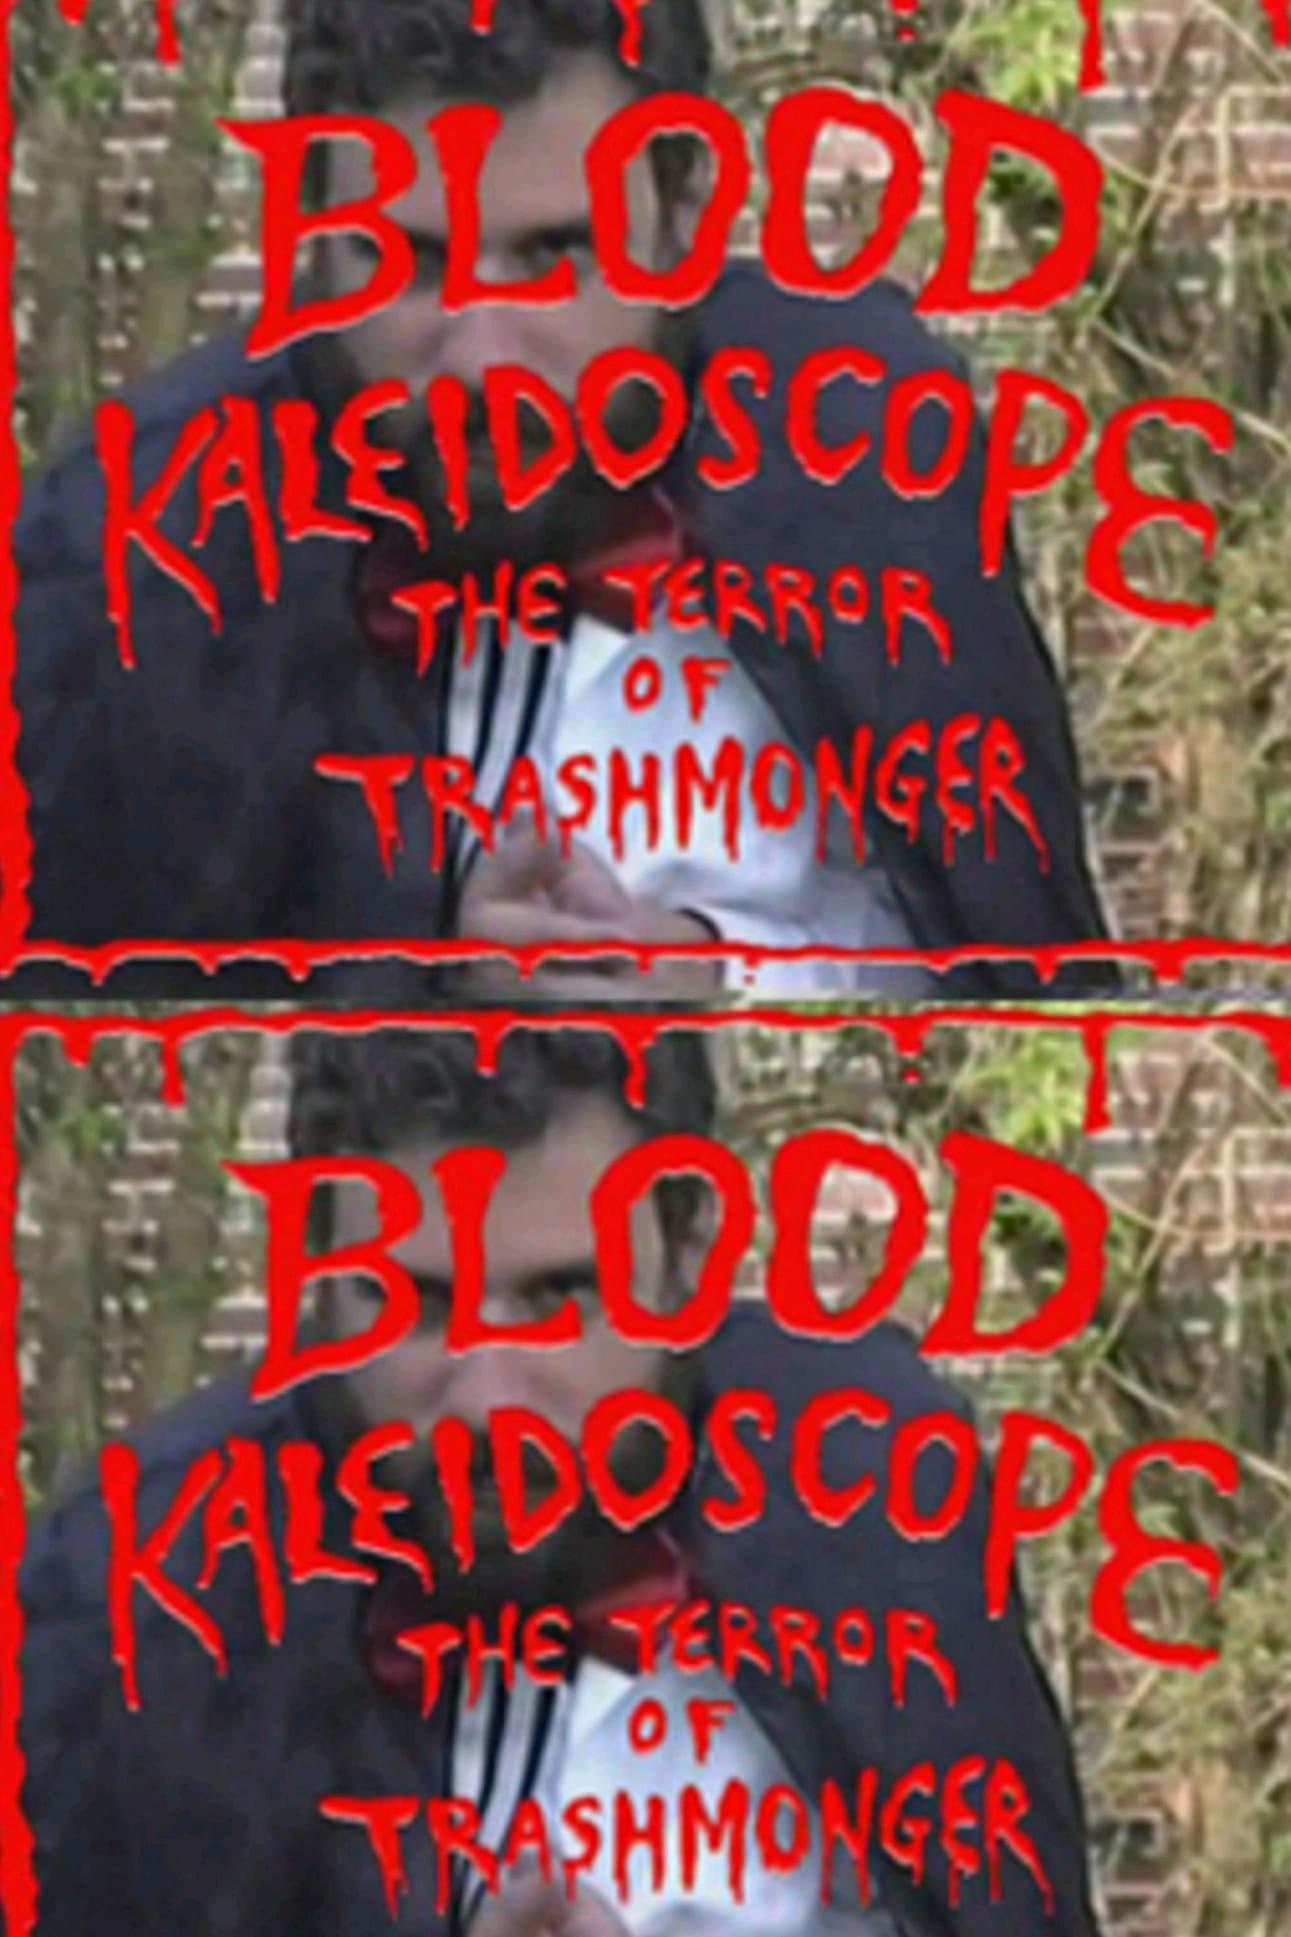 Blood Kaleidoscope: The Terror of Trashmonger Video